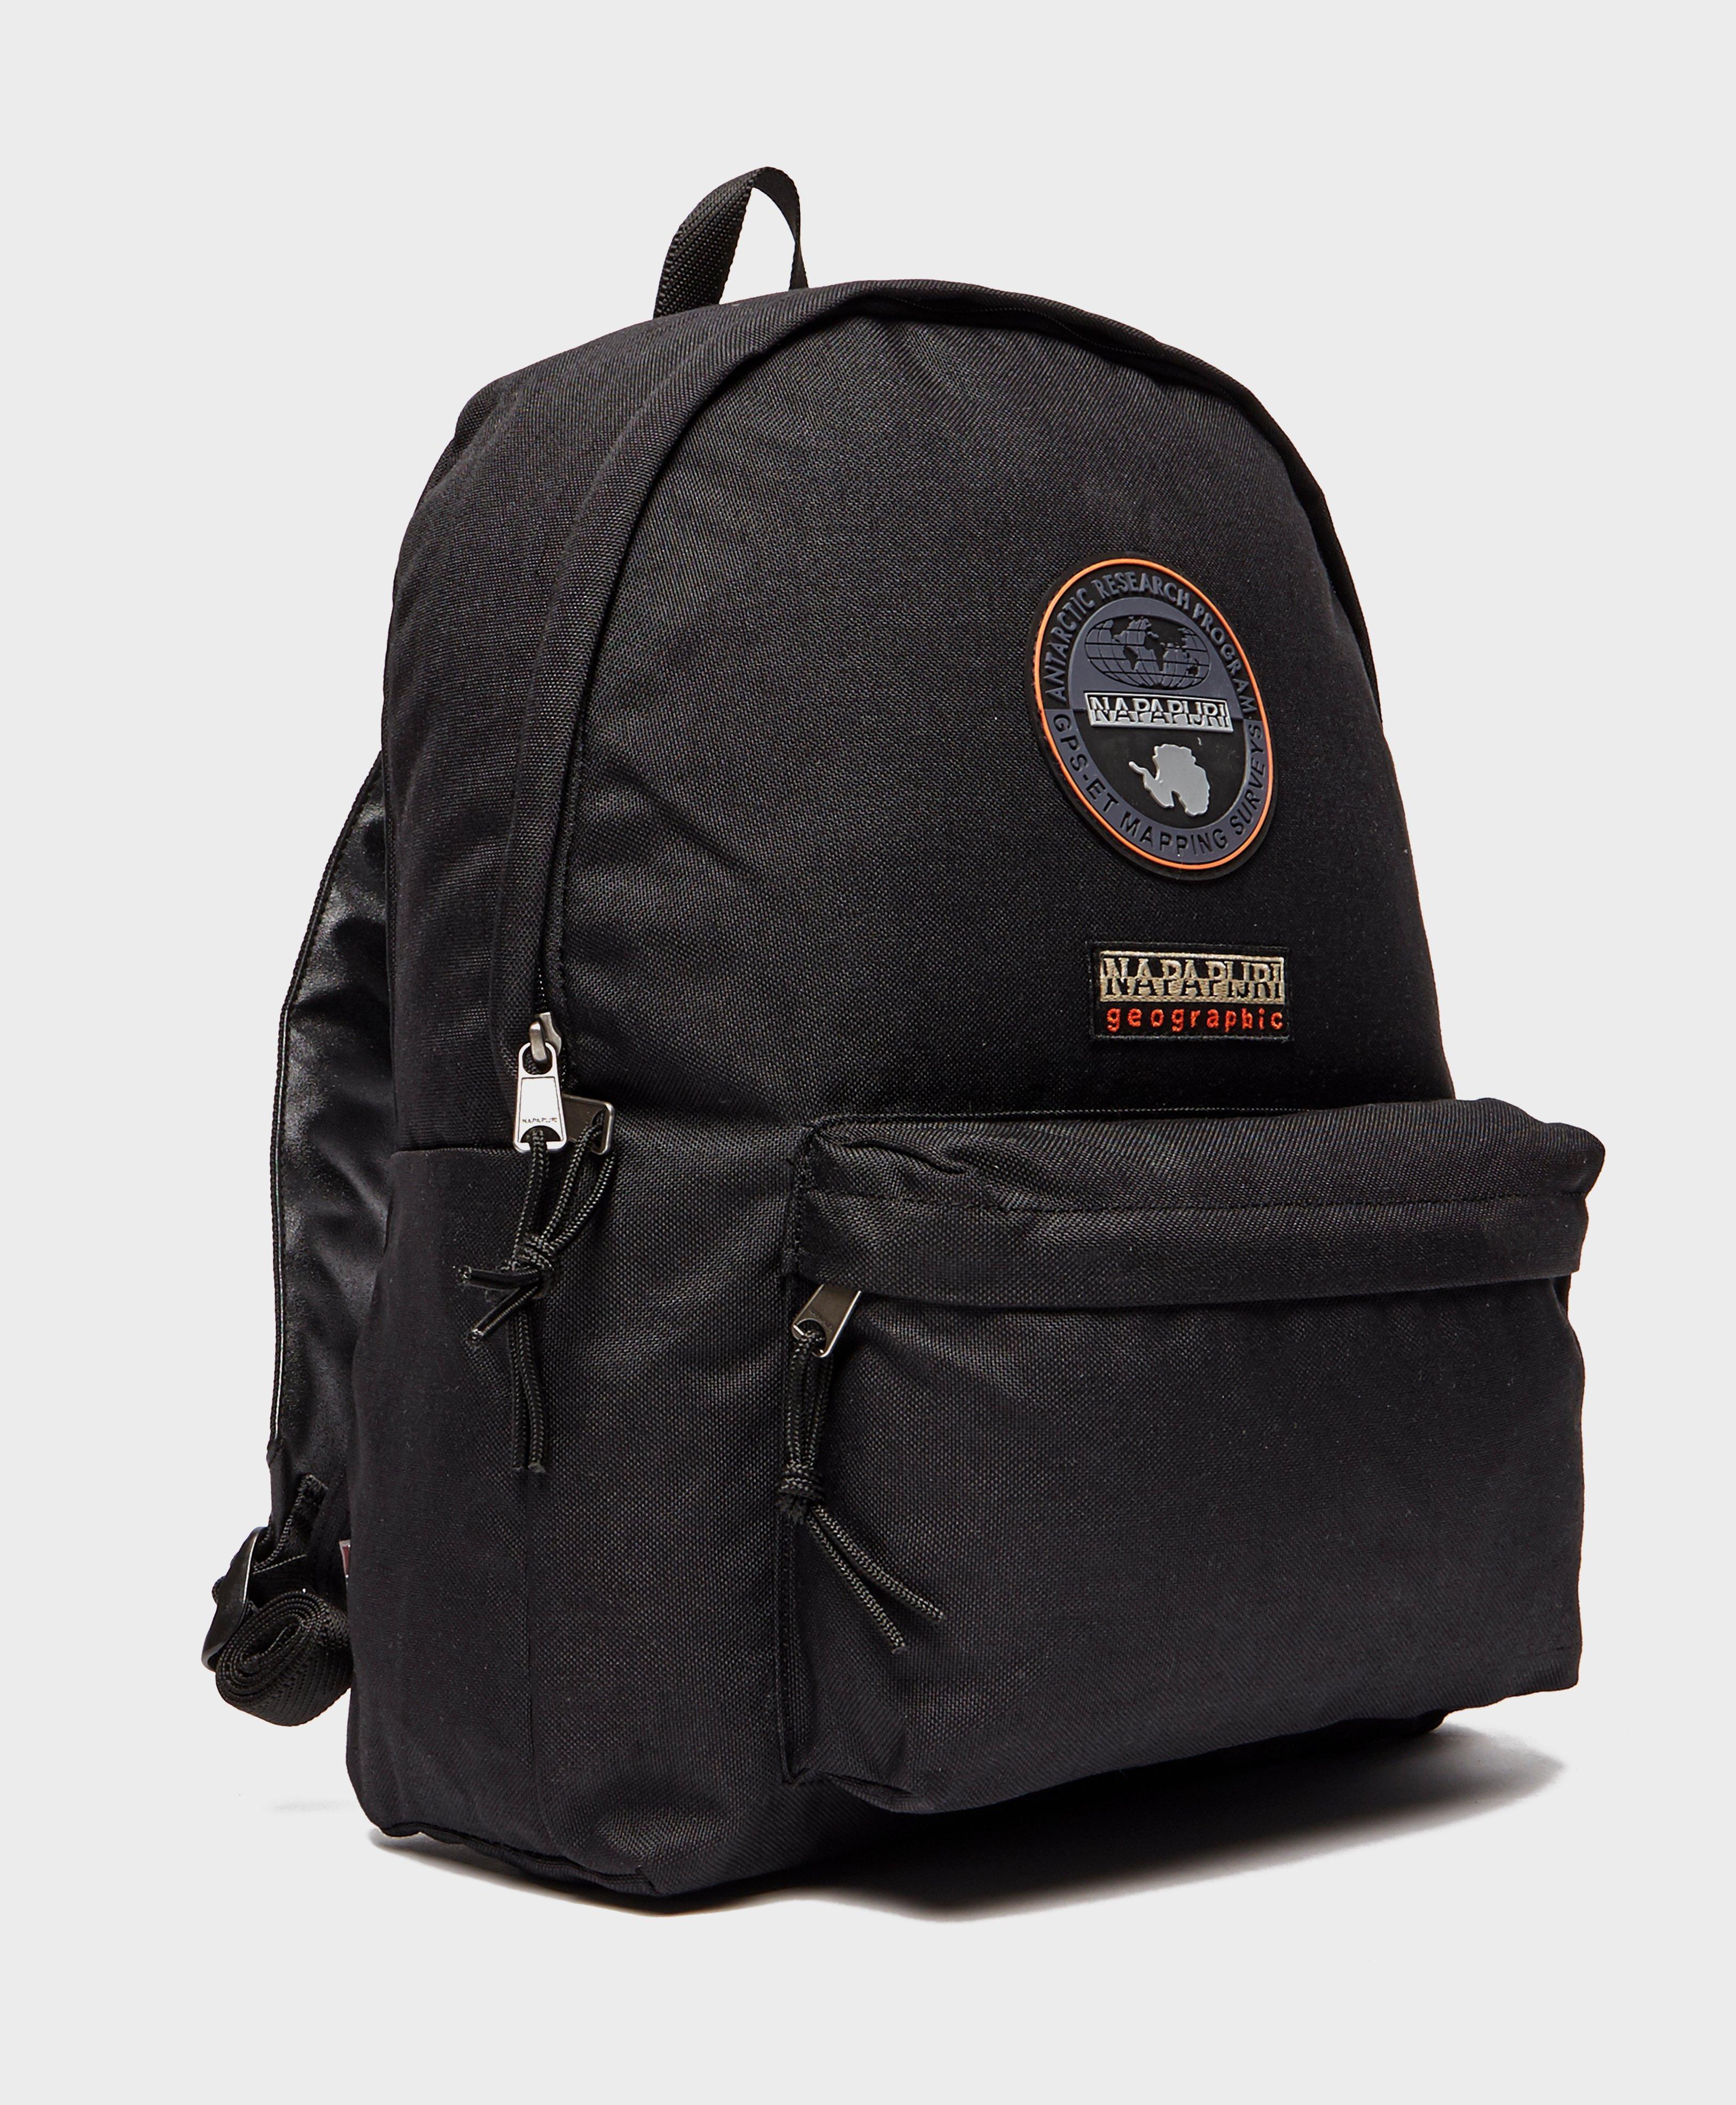 Lyst - Napapijri Voyage Backpack in Black for Men